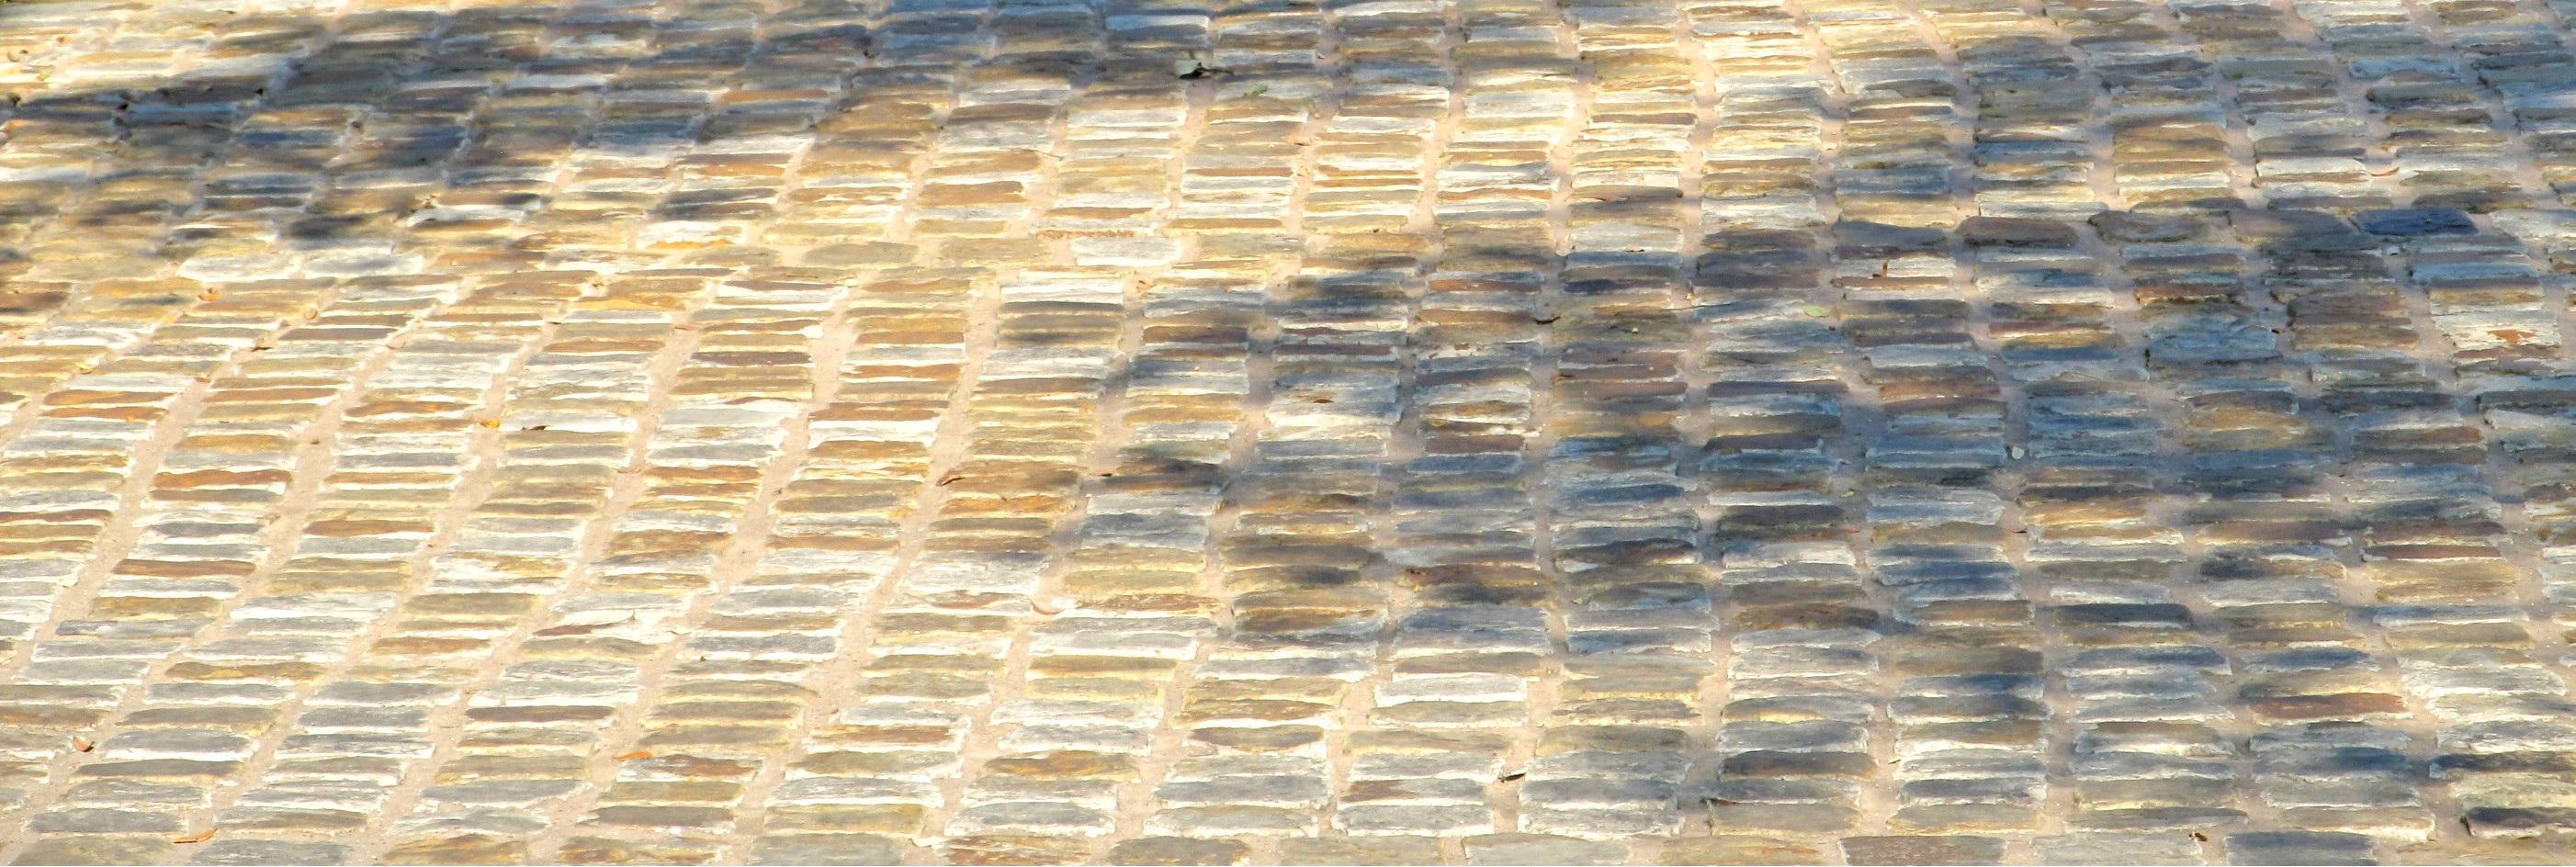 Free Images : path, pathway, texture, sidewalk, floor, cobblestone ...